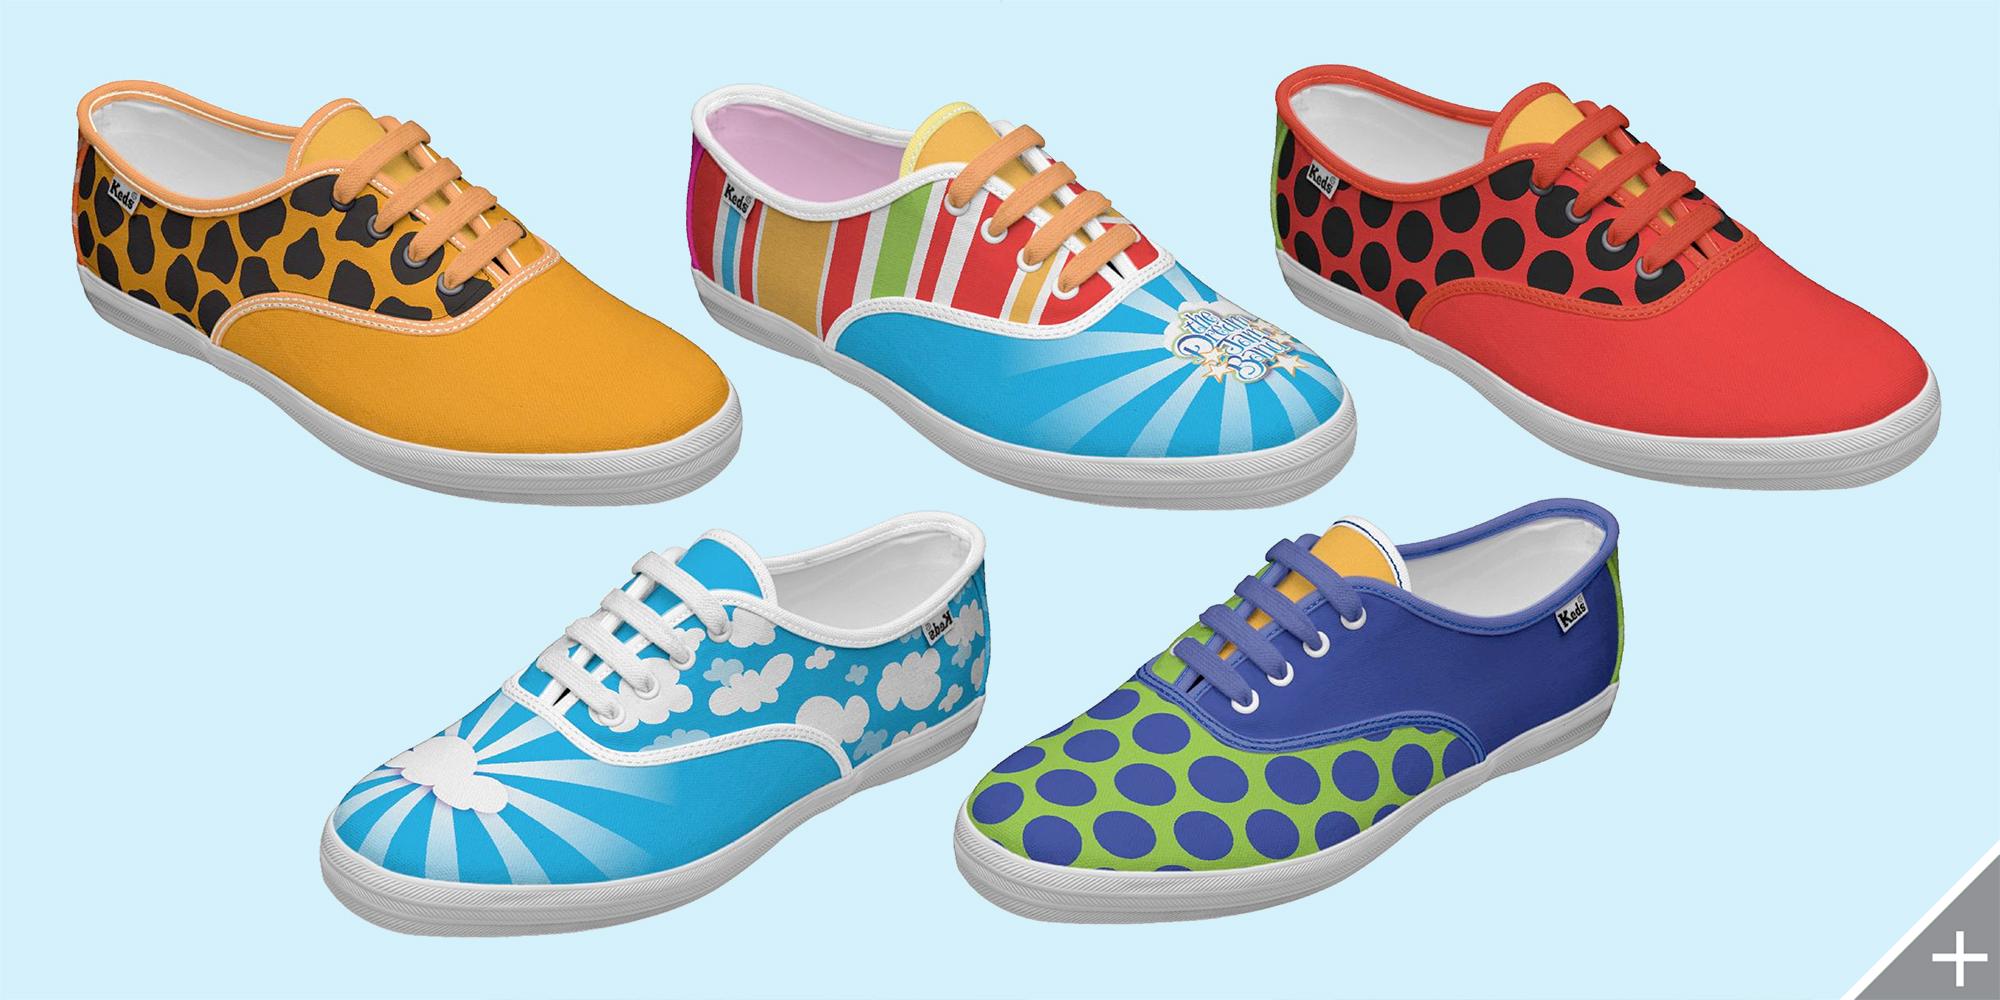 MERCHANDISE DESIGN - The Dream Jam Band   shoes - ©UnParalleled, LLC dba UP-Ideas / Roger Sawhill / Mark Braught - Atlanta, Georgia   Lawrenceville, Georgia   Commerce, Georgia